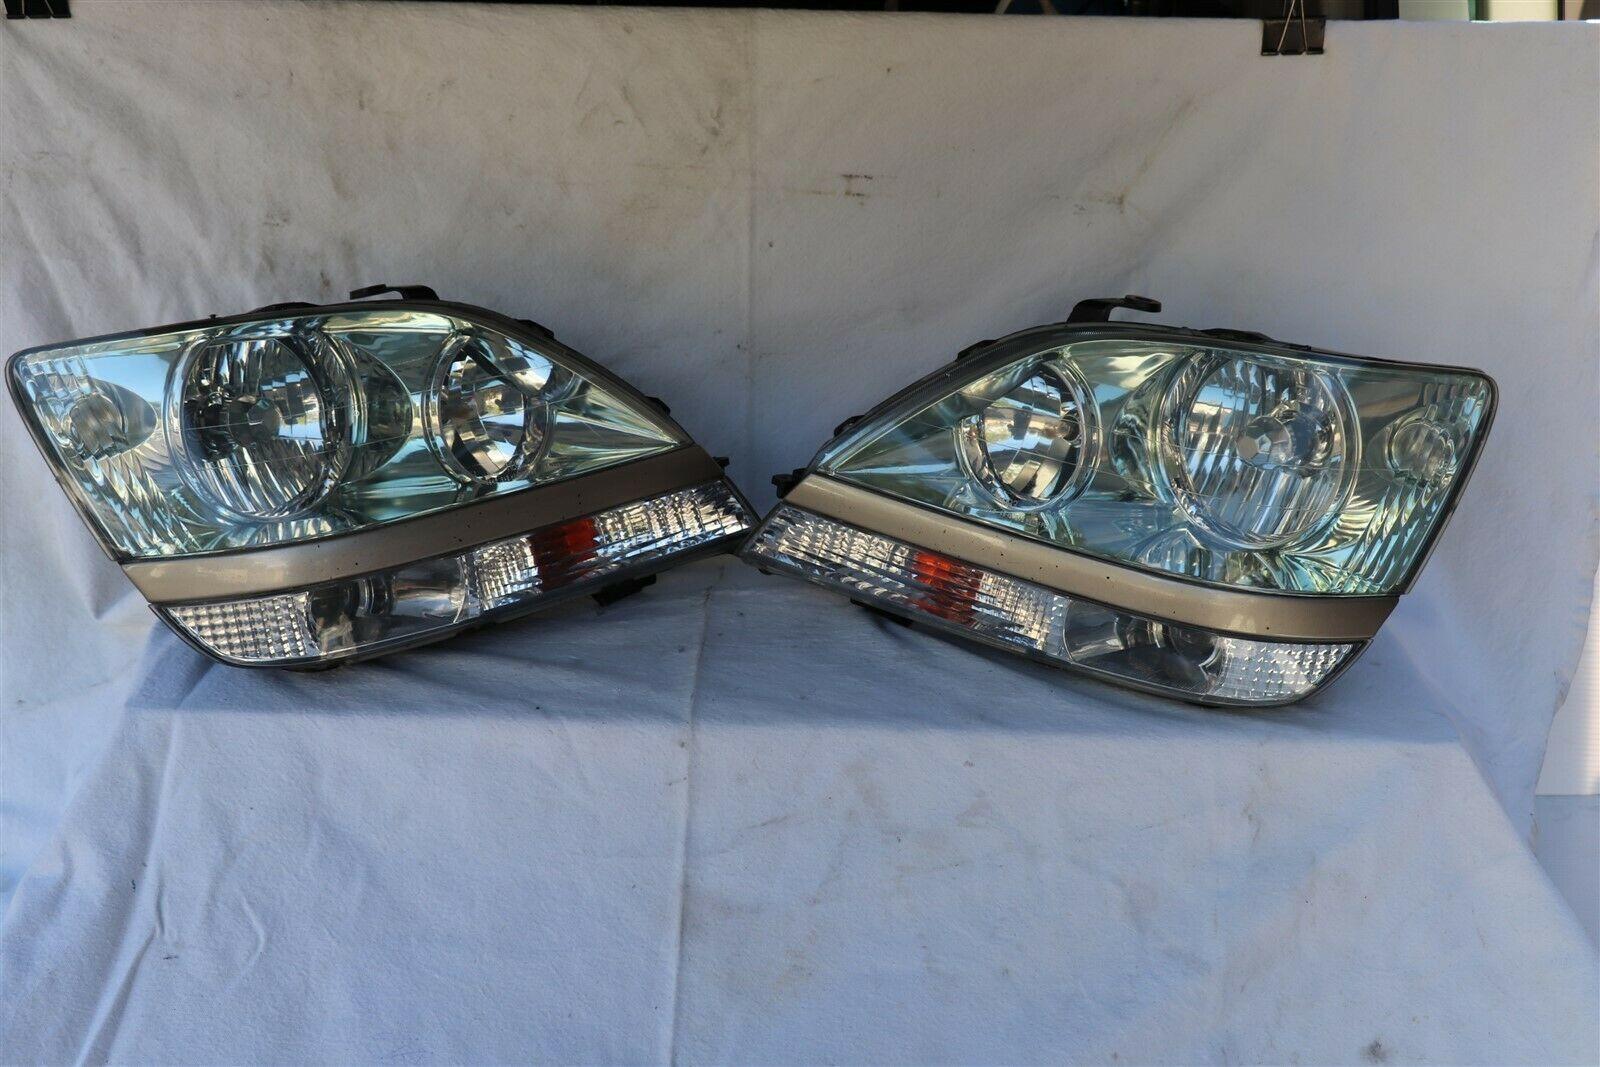 99-03 Lexus RX300 HID Xenon Headlight Lamp Matching Set Pair L&R - POLISHED